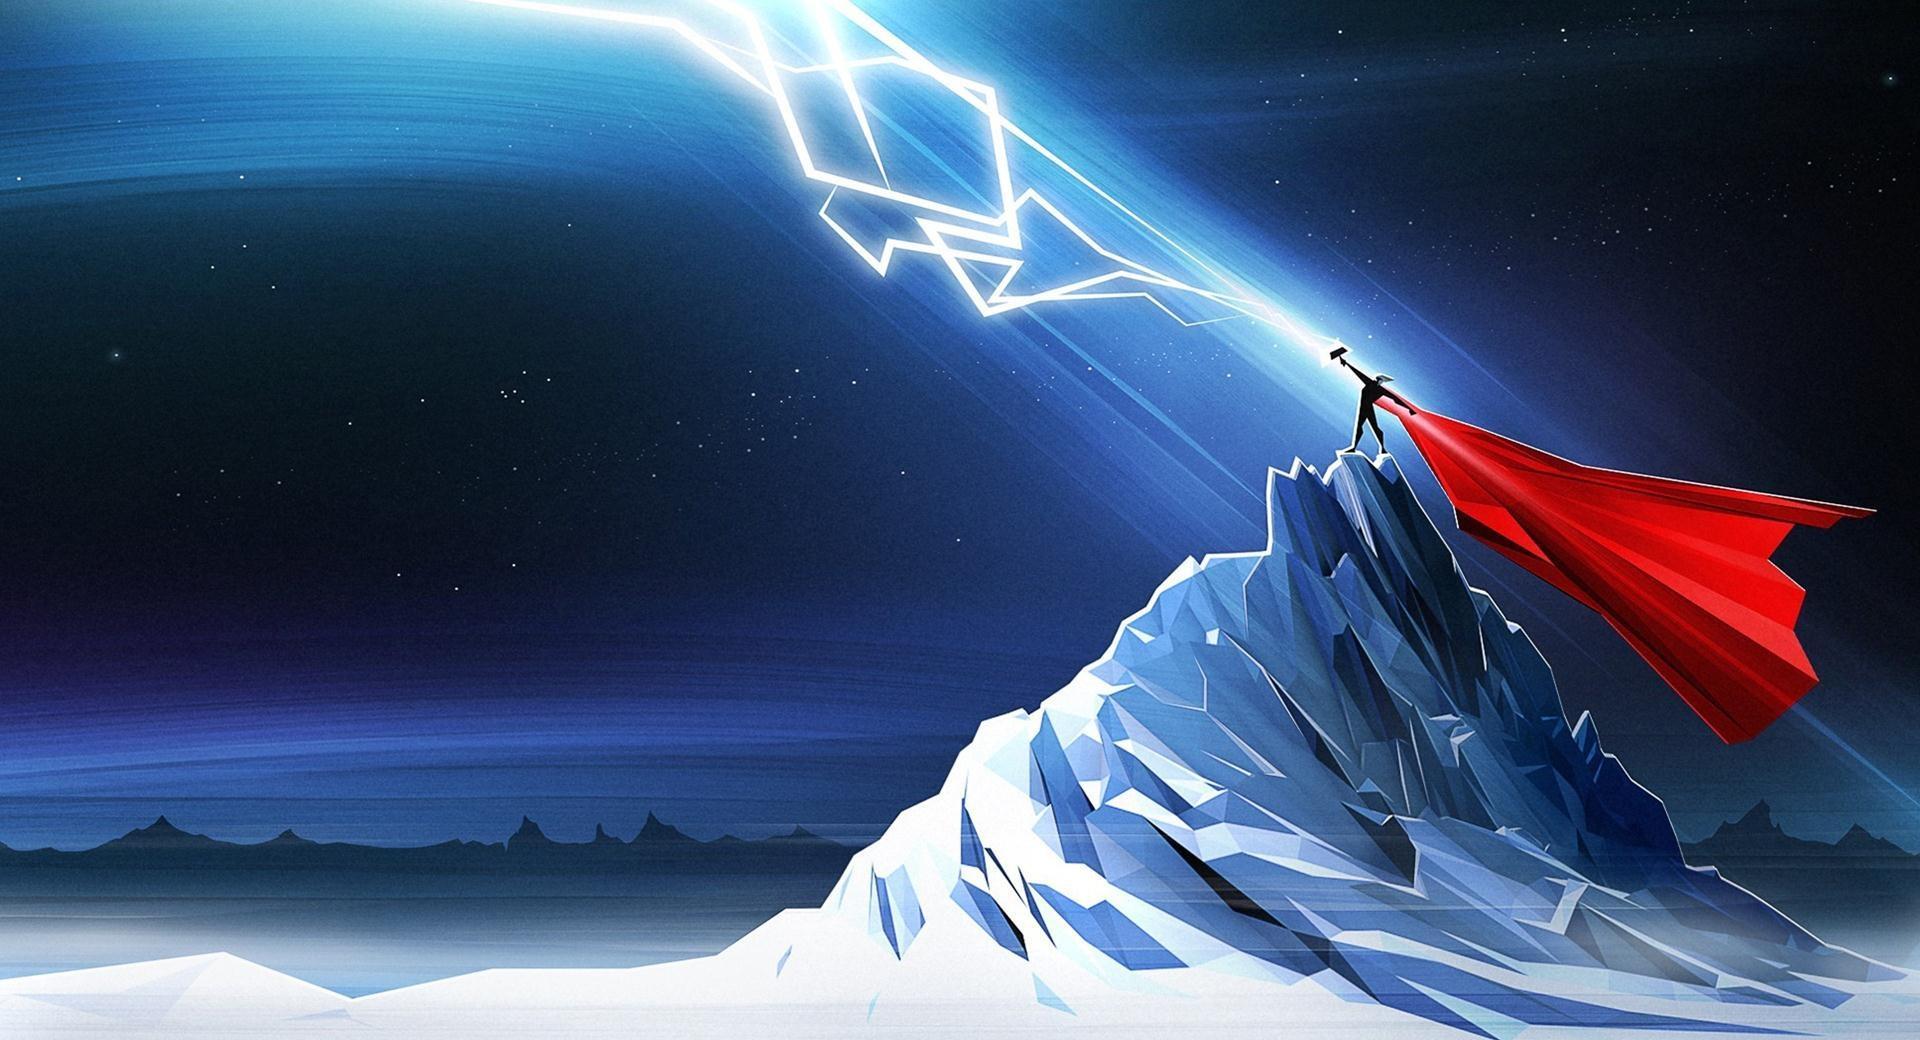 Thor Lightning Art wallpapers HD quality